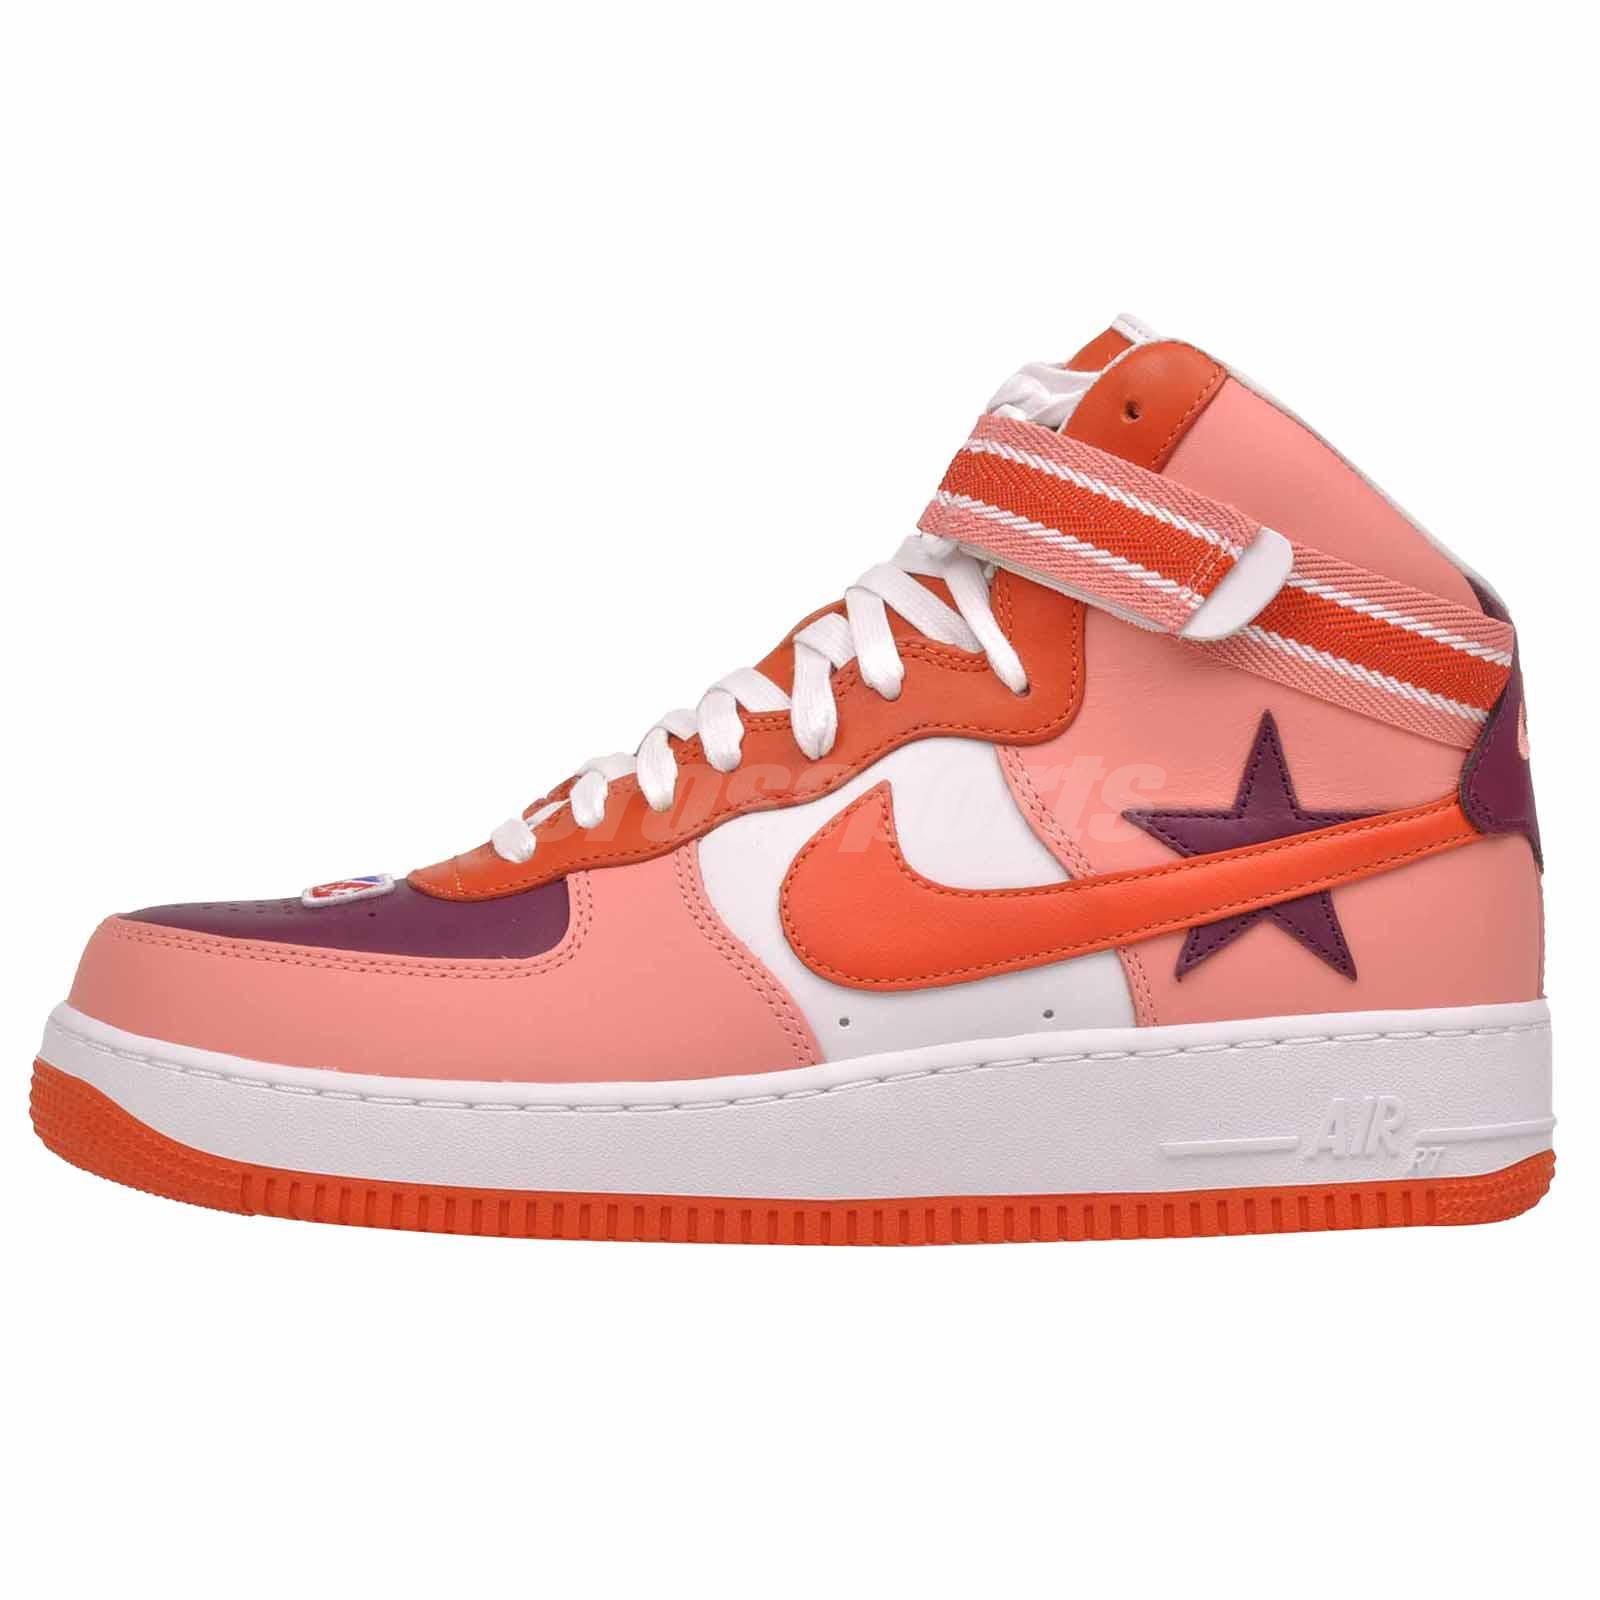 Rt Tisci Basketball Details Aq3366 About Air Mens 1 Hi Shoes Nike Force 601 Riccardo QdxBerCWEo